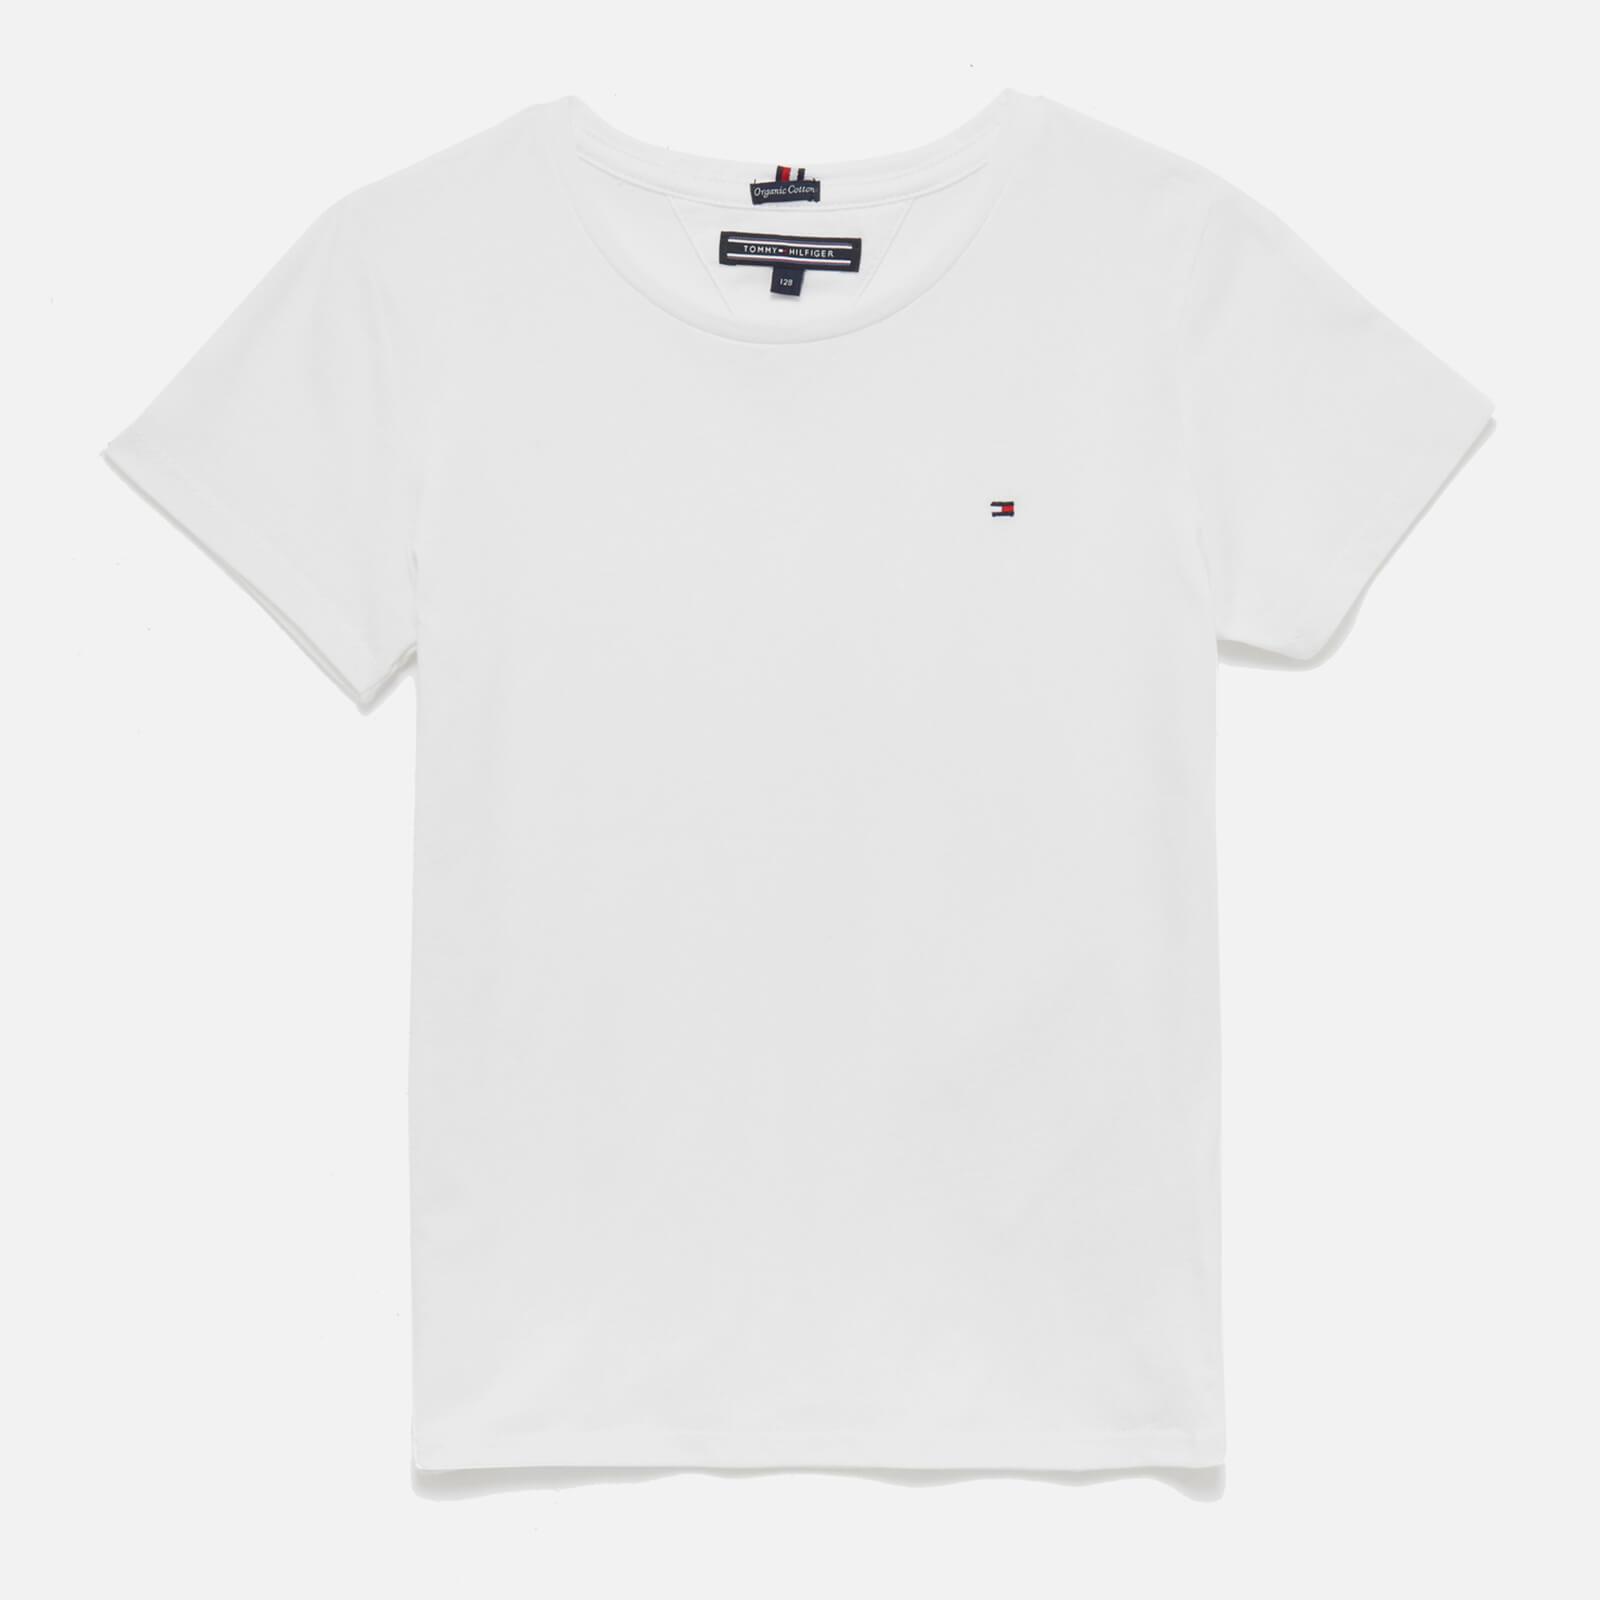 Tommy Kids Girls' Short Sleeve T-Shirt - Bright White - 12 Years